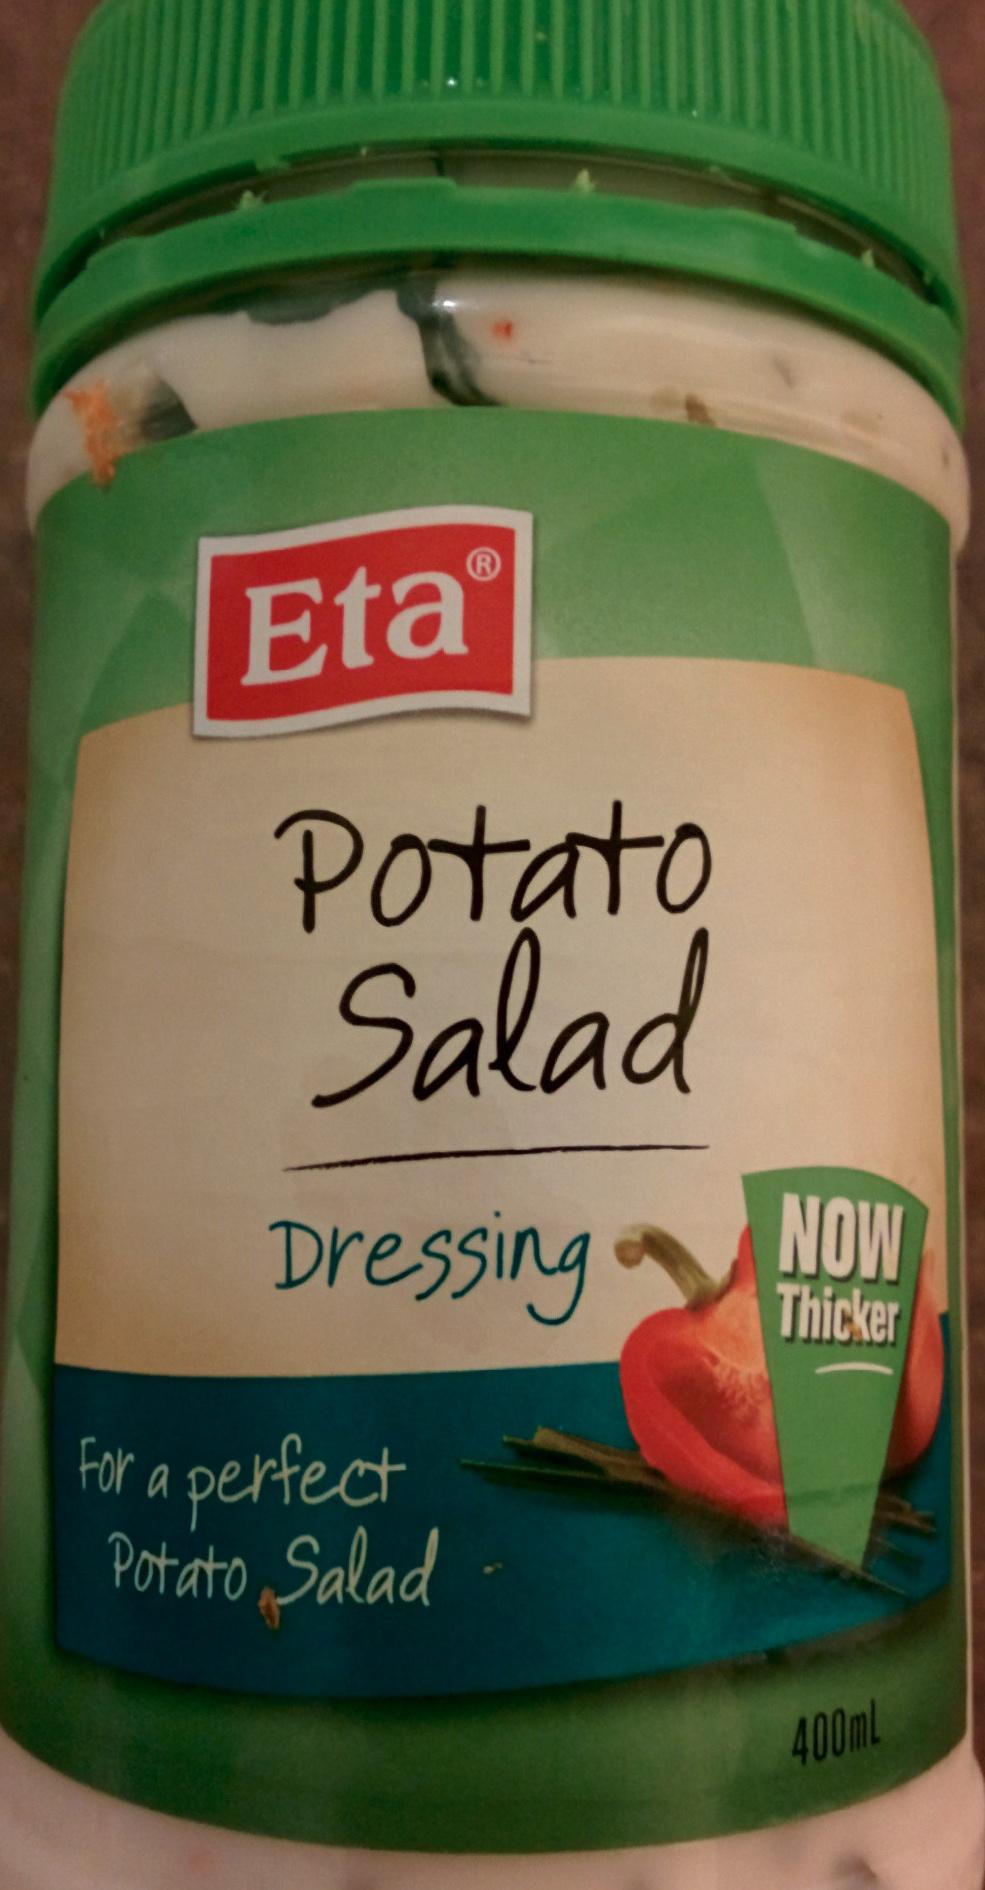 Potato Salad Dressing - Product